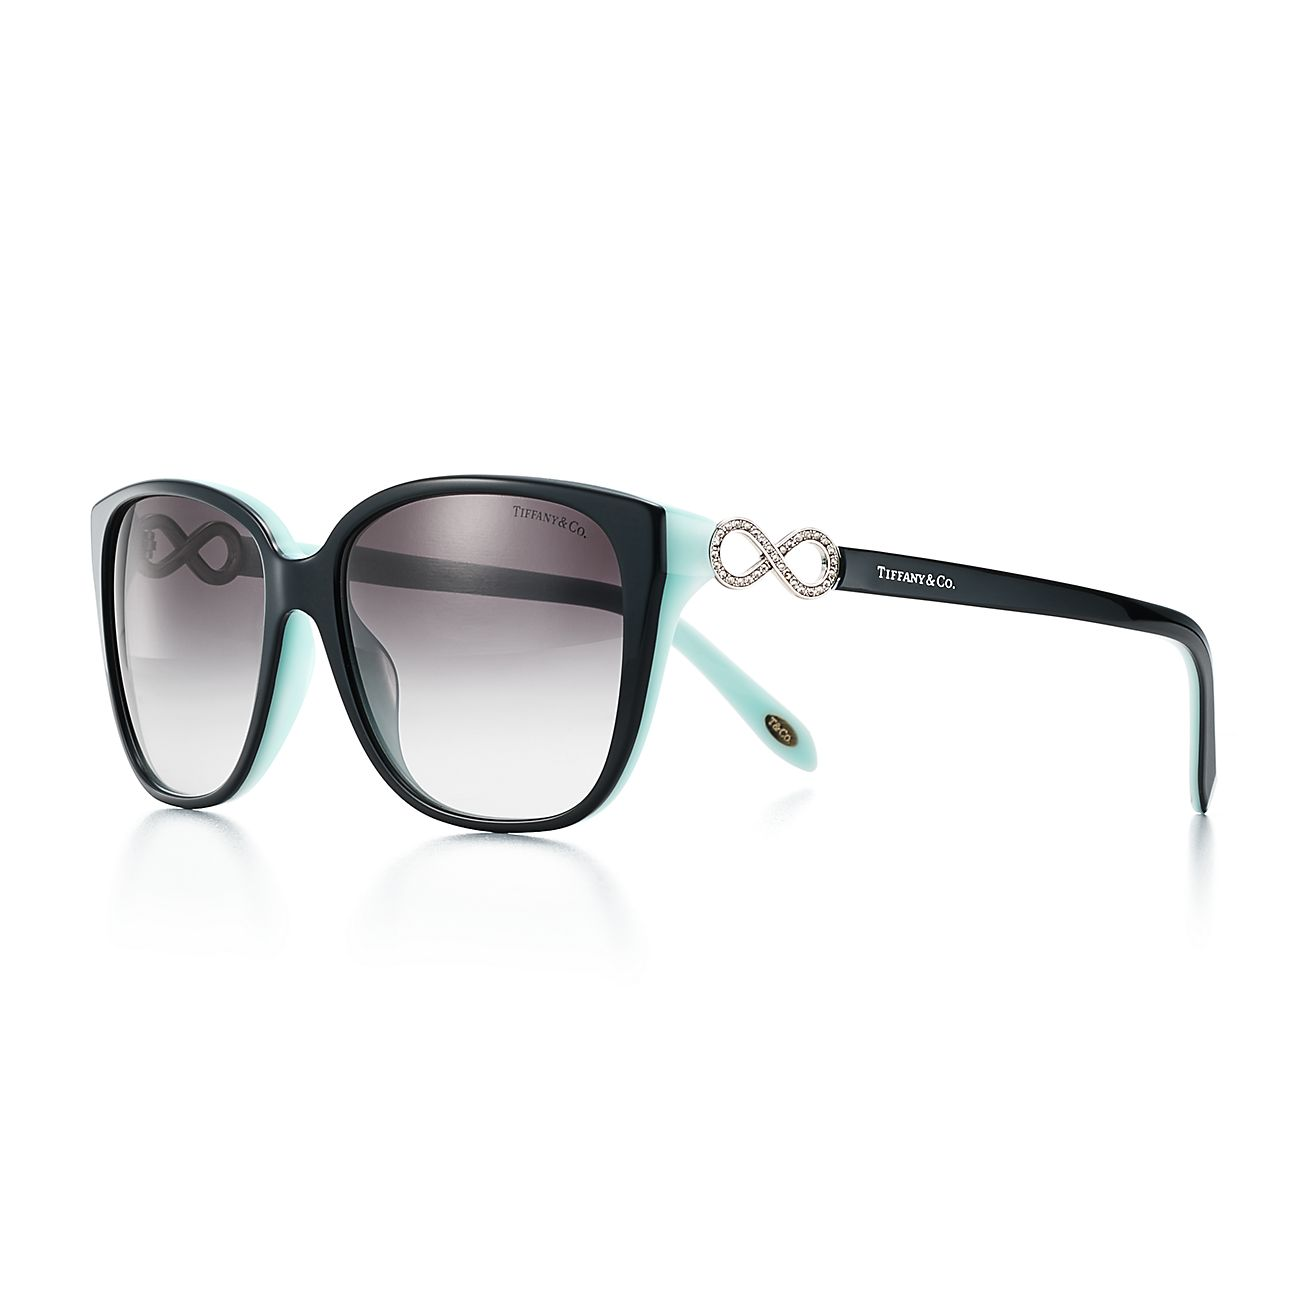 Tiffany Infinity square sunglasses in black and Tiffany ...